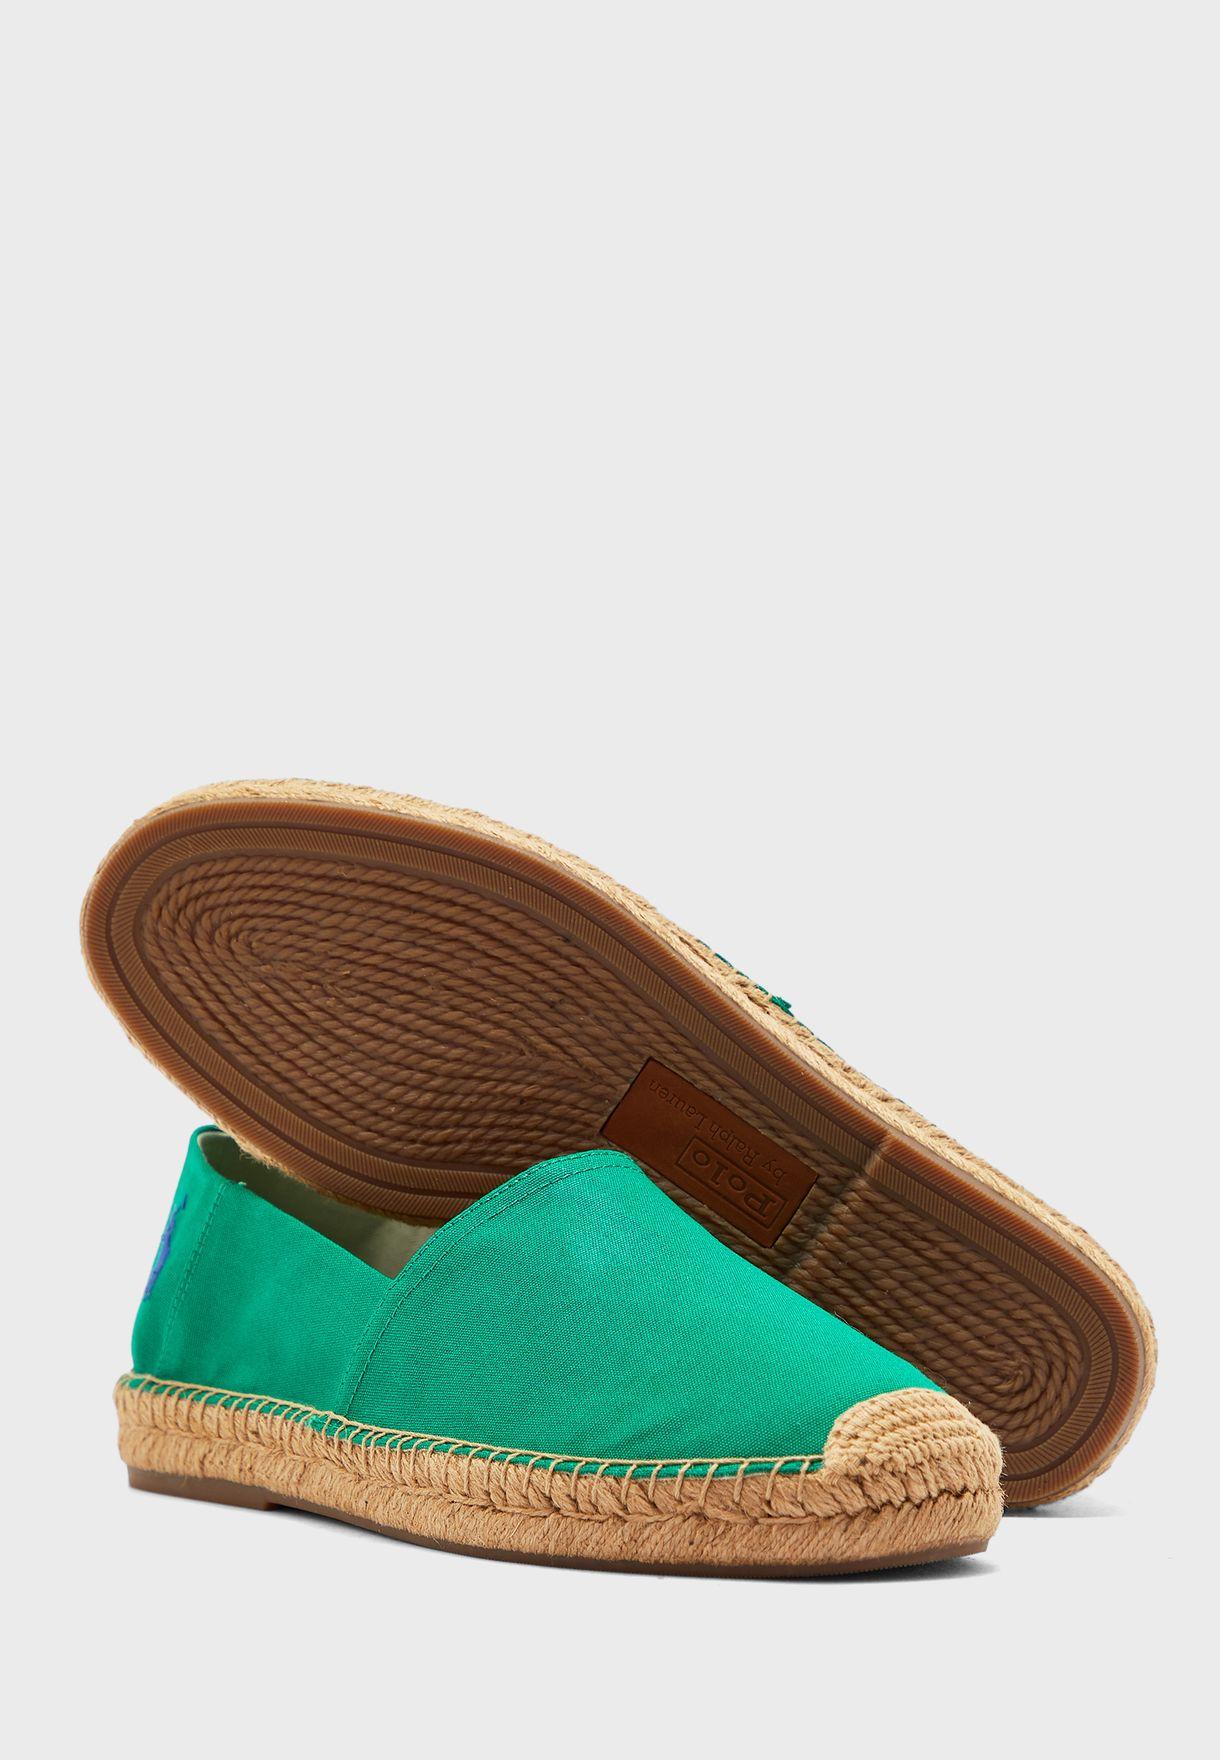 Cevio Loafer